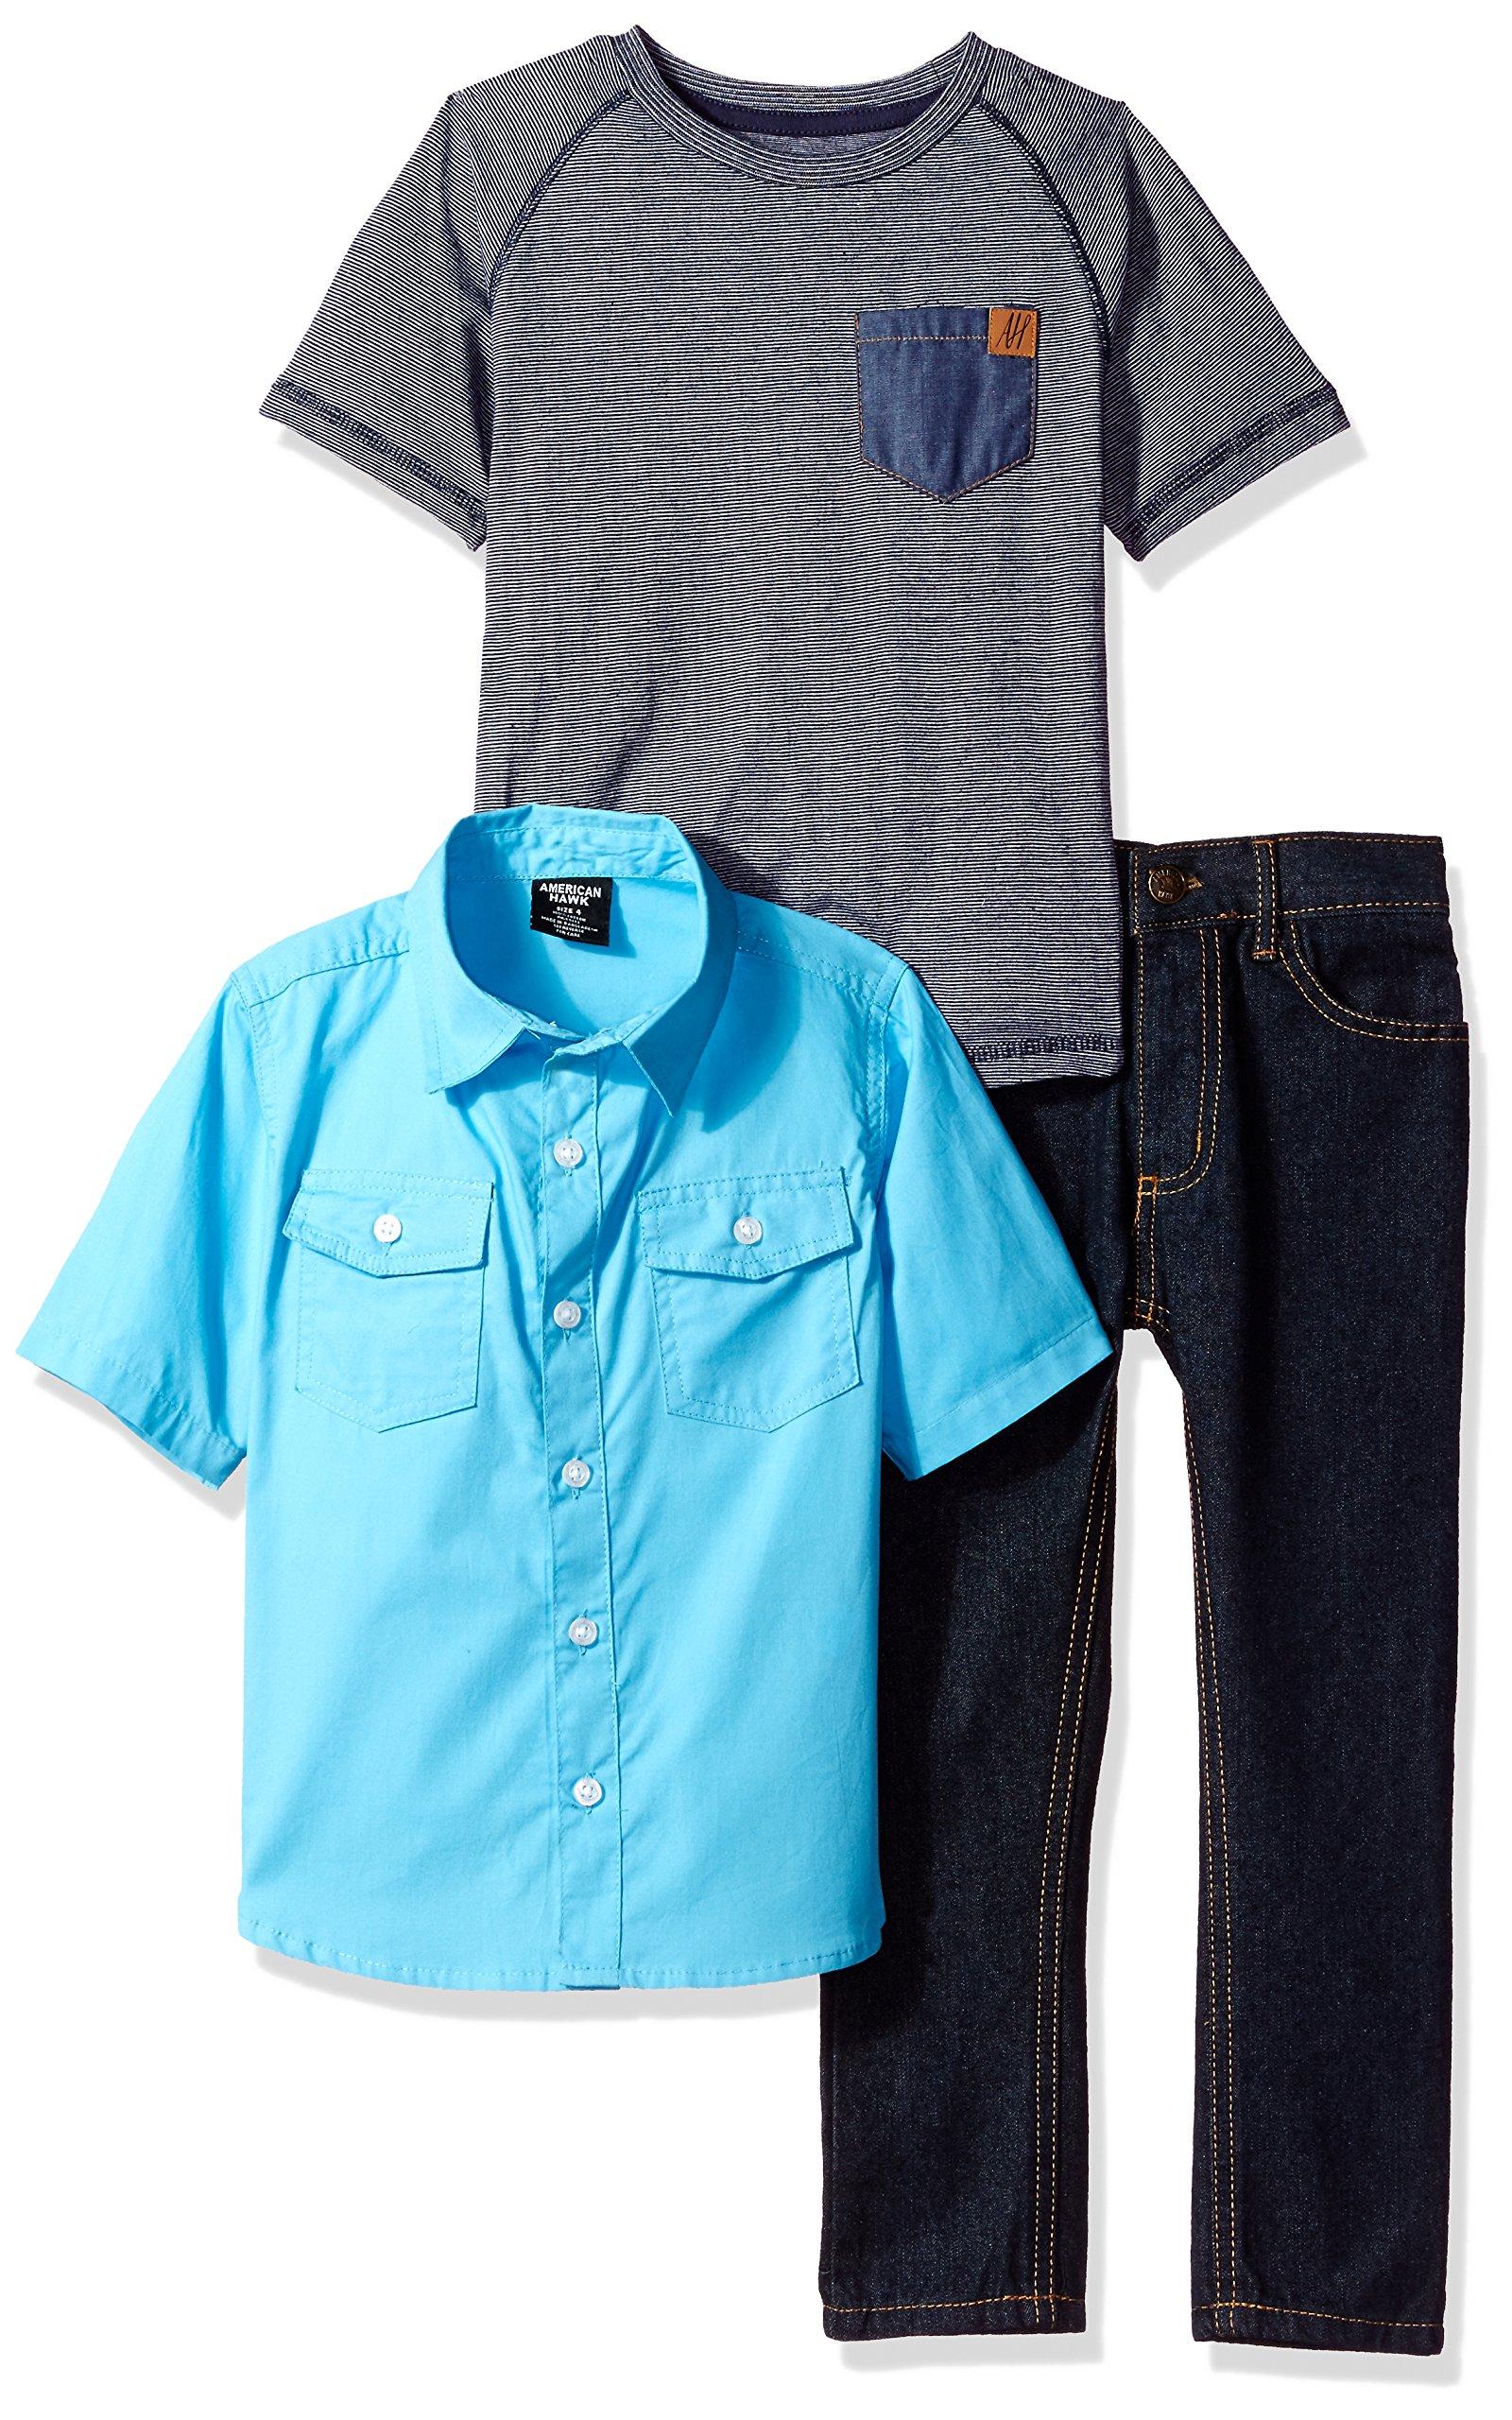 American Hawk Toddler Boys' Short Sleeve